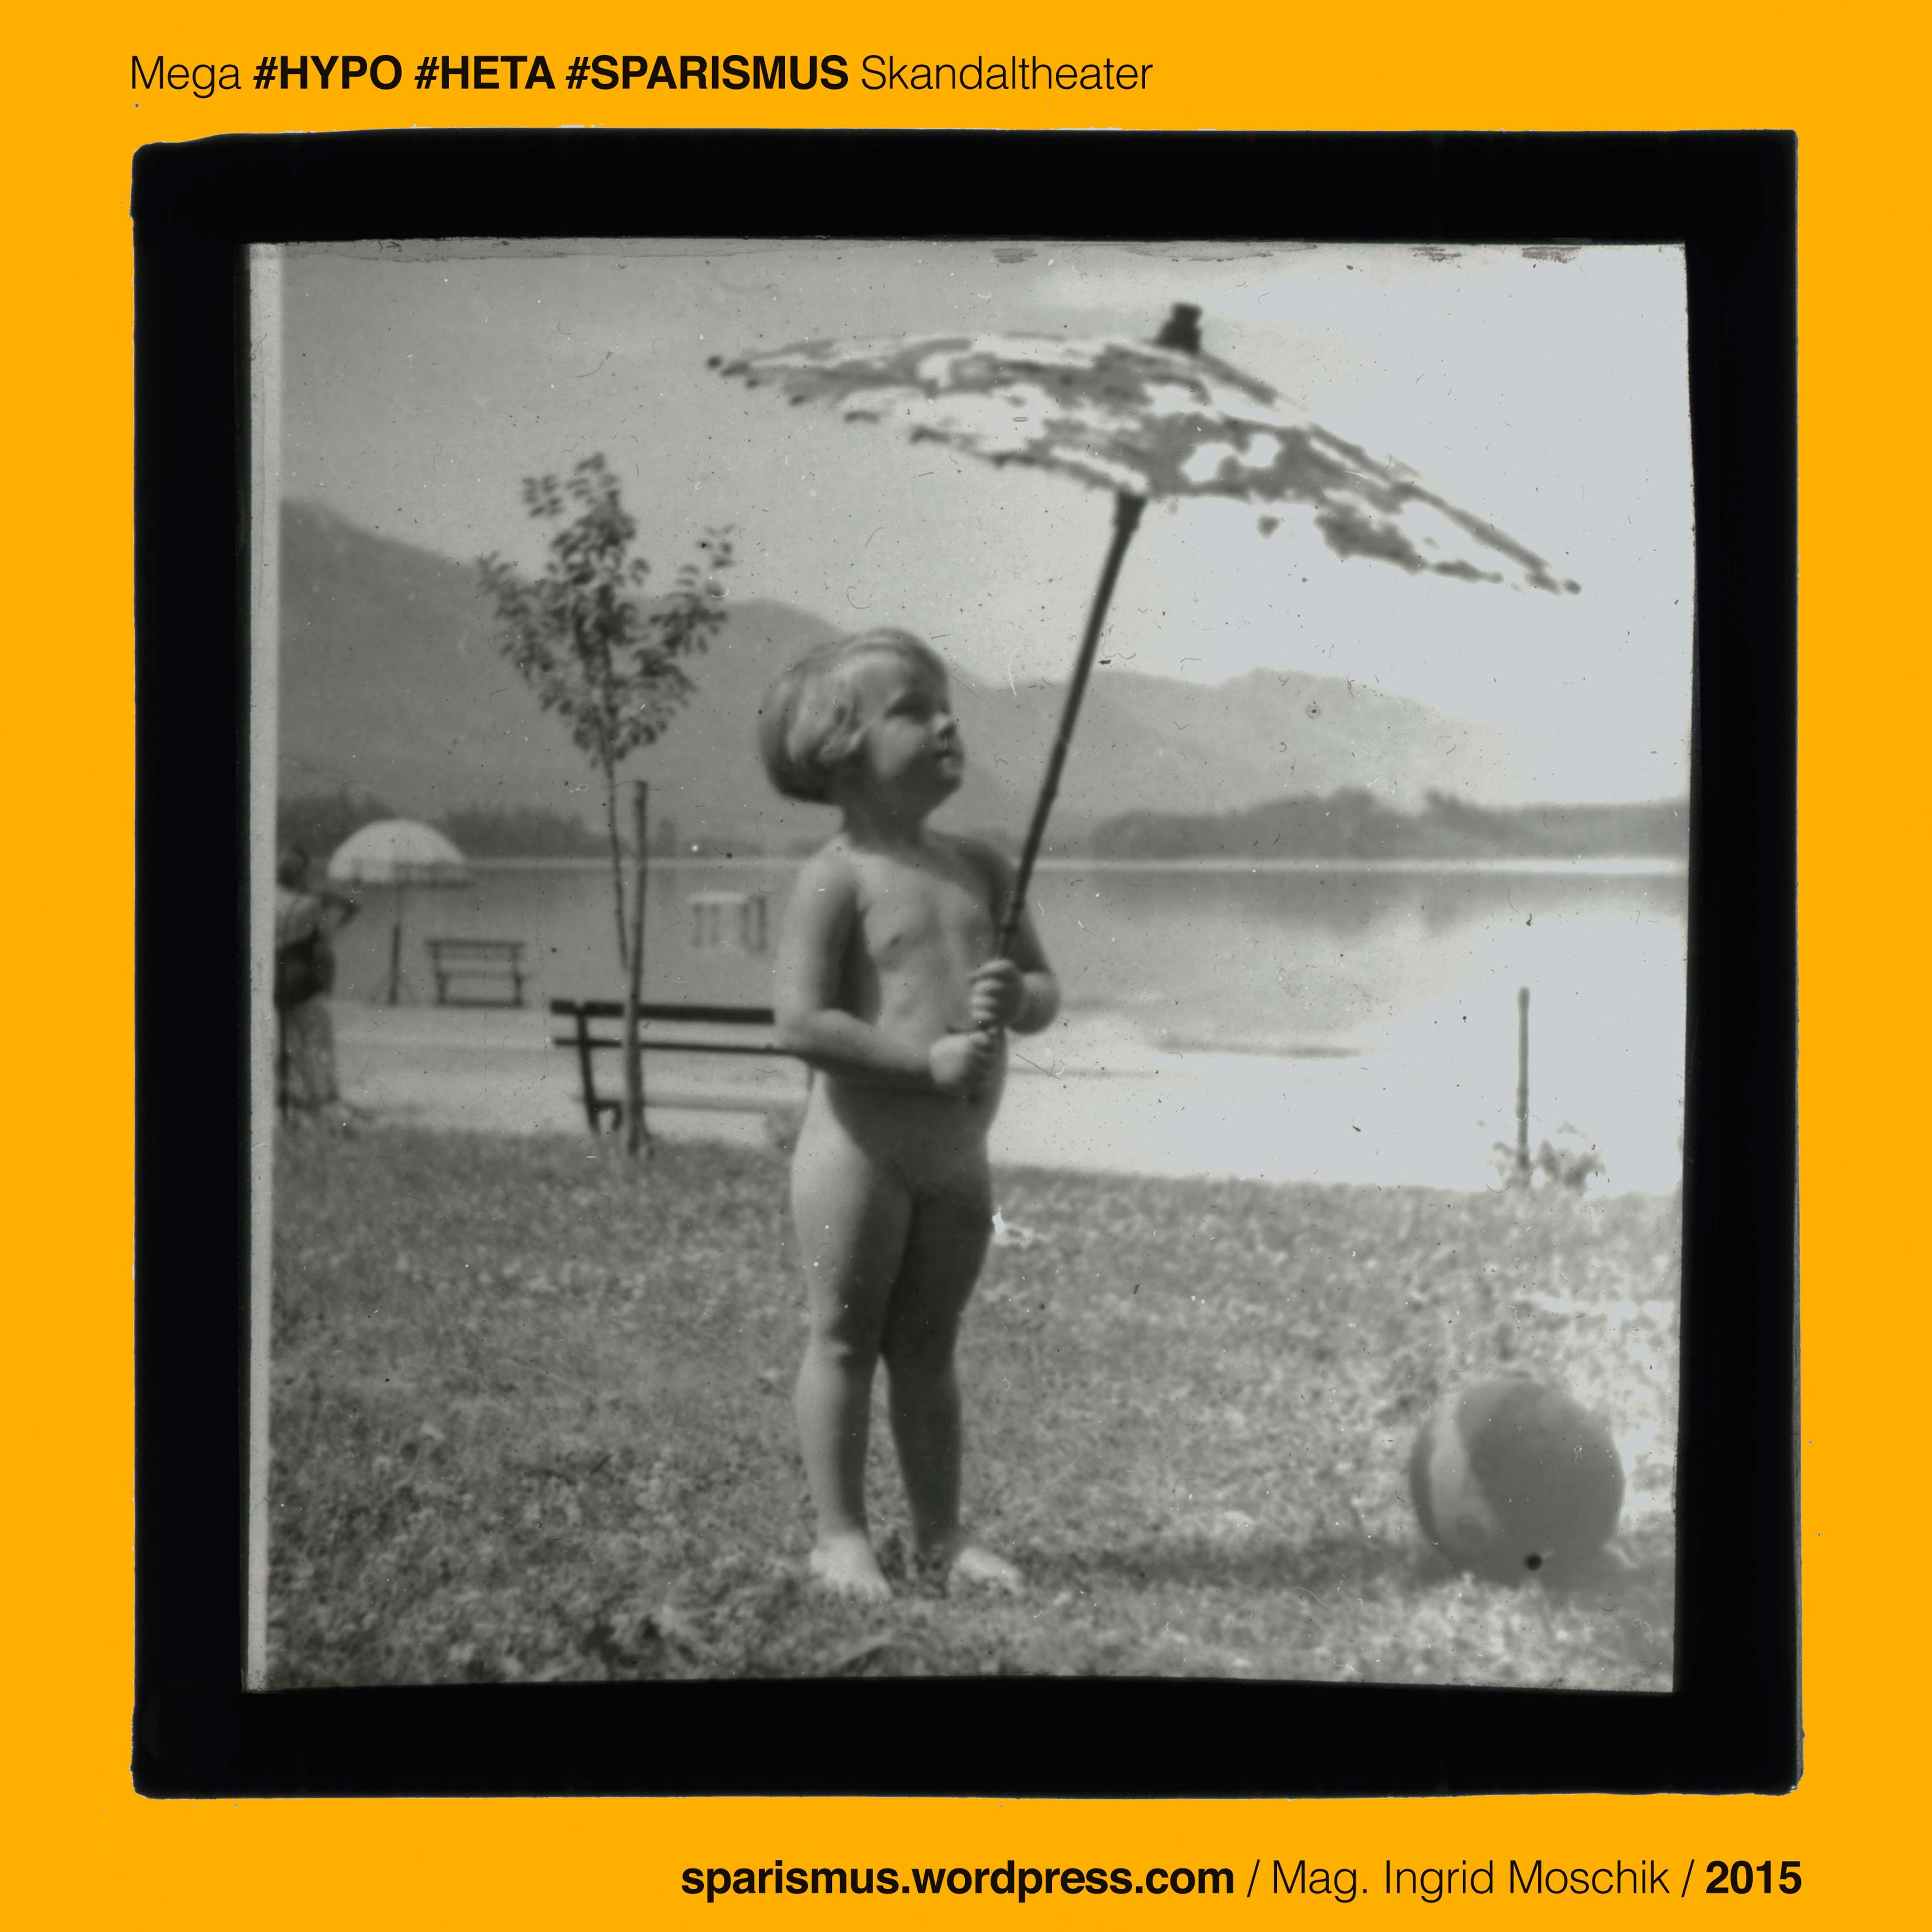 Hypo Heta Sparismus Arthur Benda FKK 1930 33 kleines Wiener